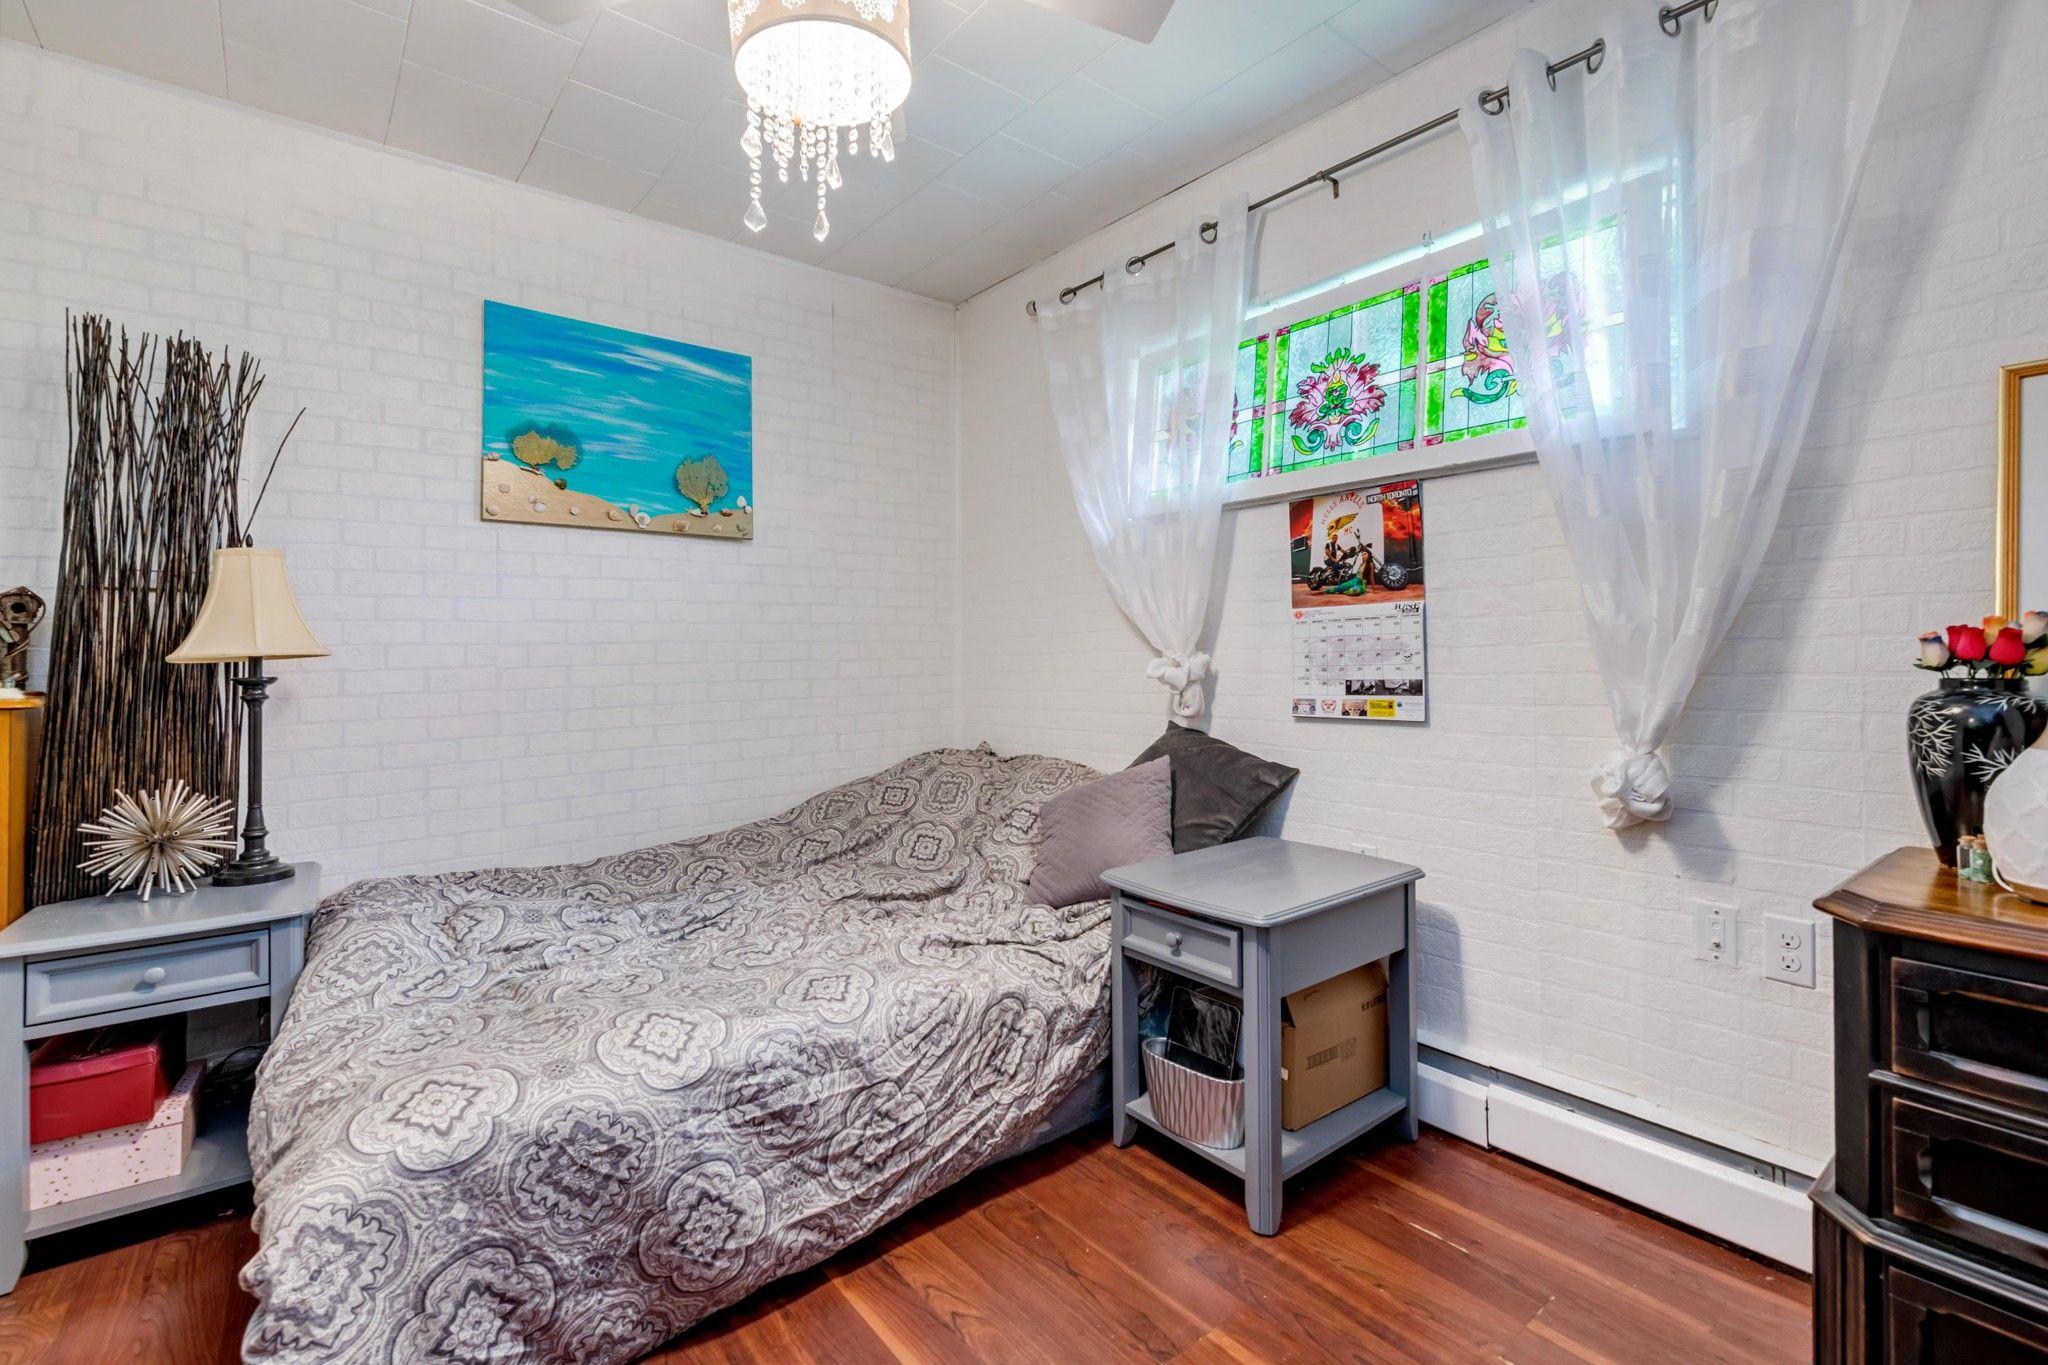 Photo 10: Photos: 20623 114 Avenue in Maple Ridge: Southwest Maple Ridge House for sale : MLS®# R2465656